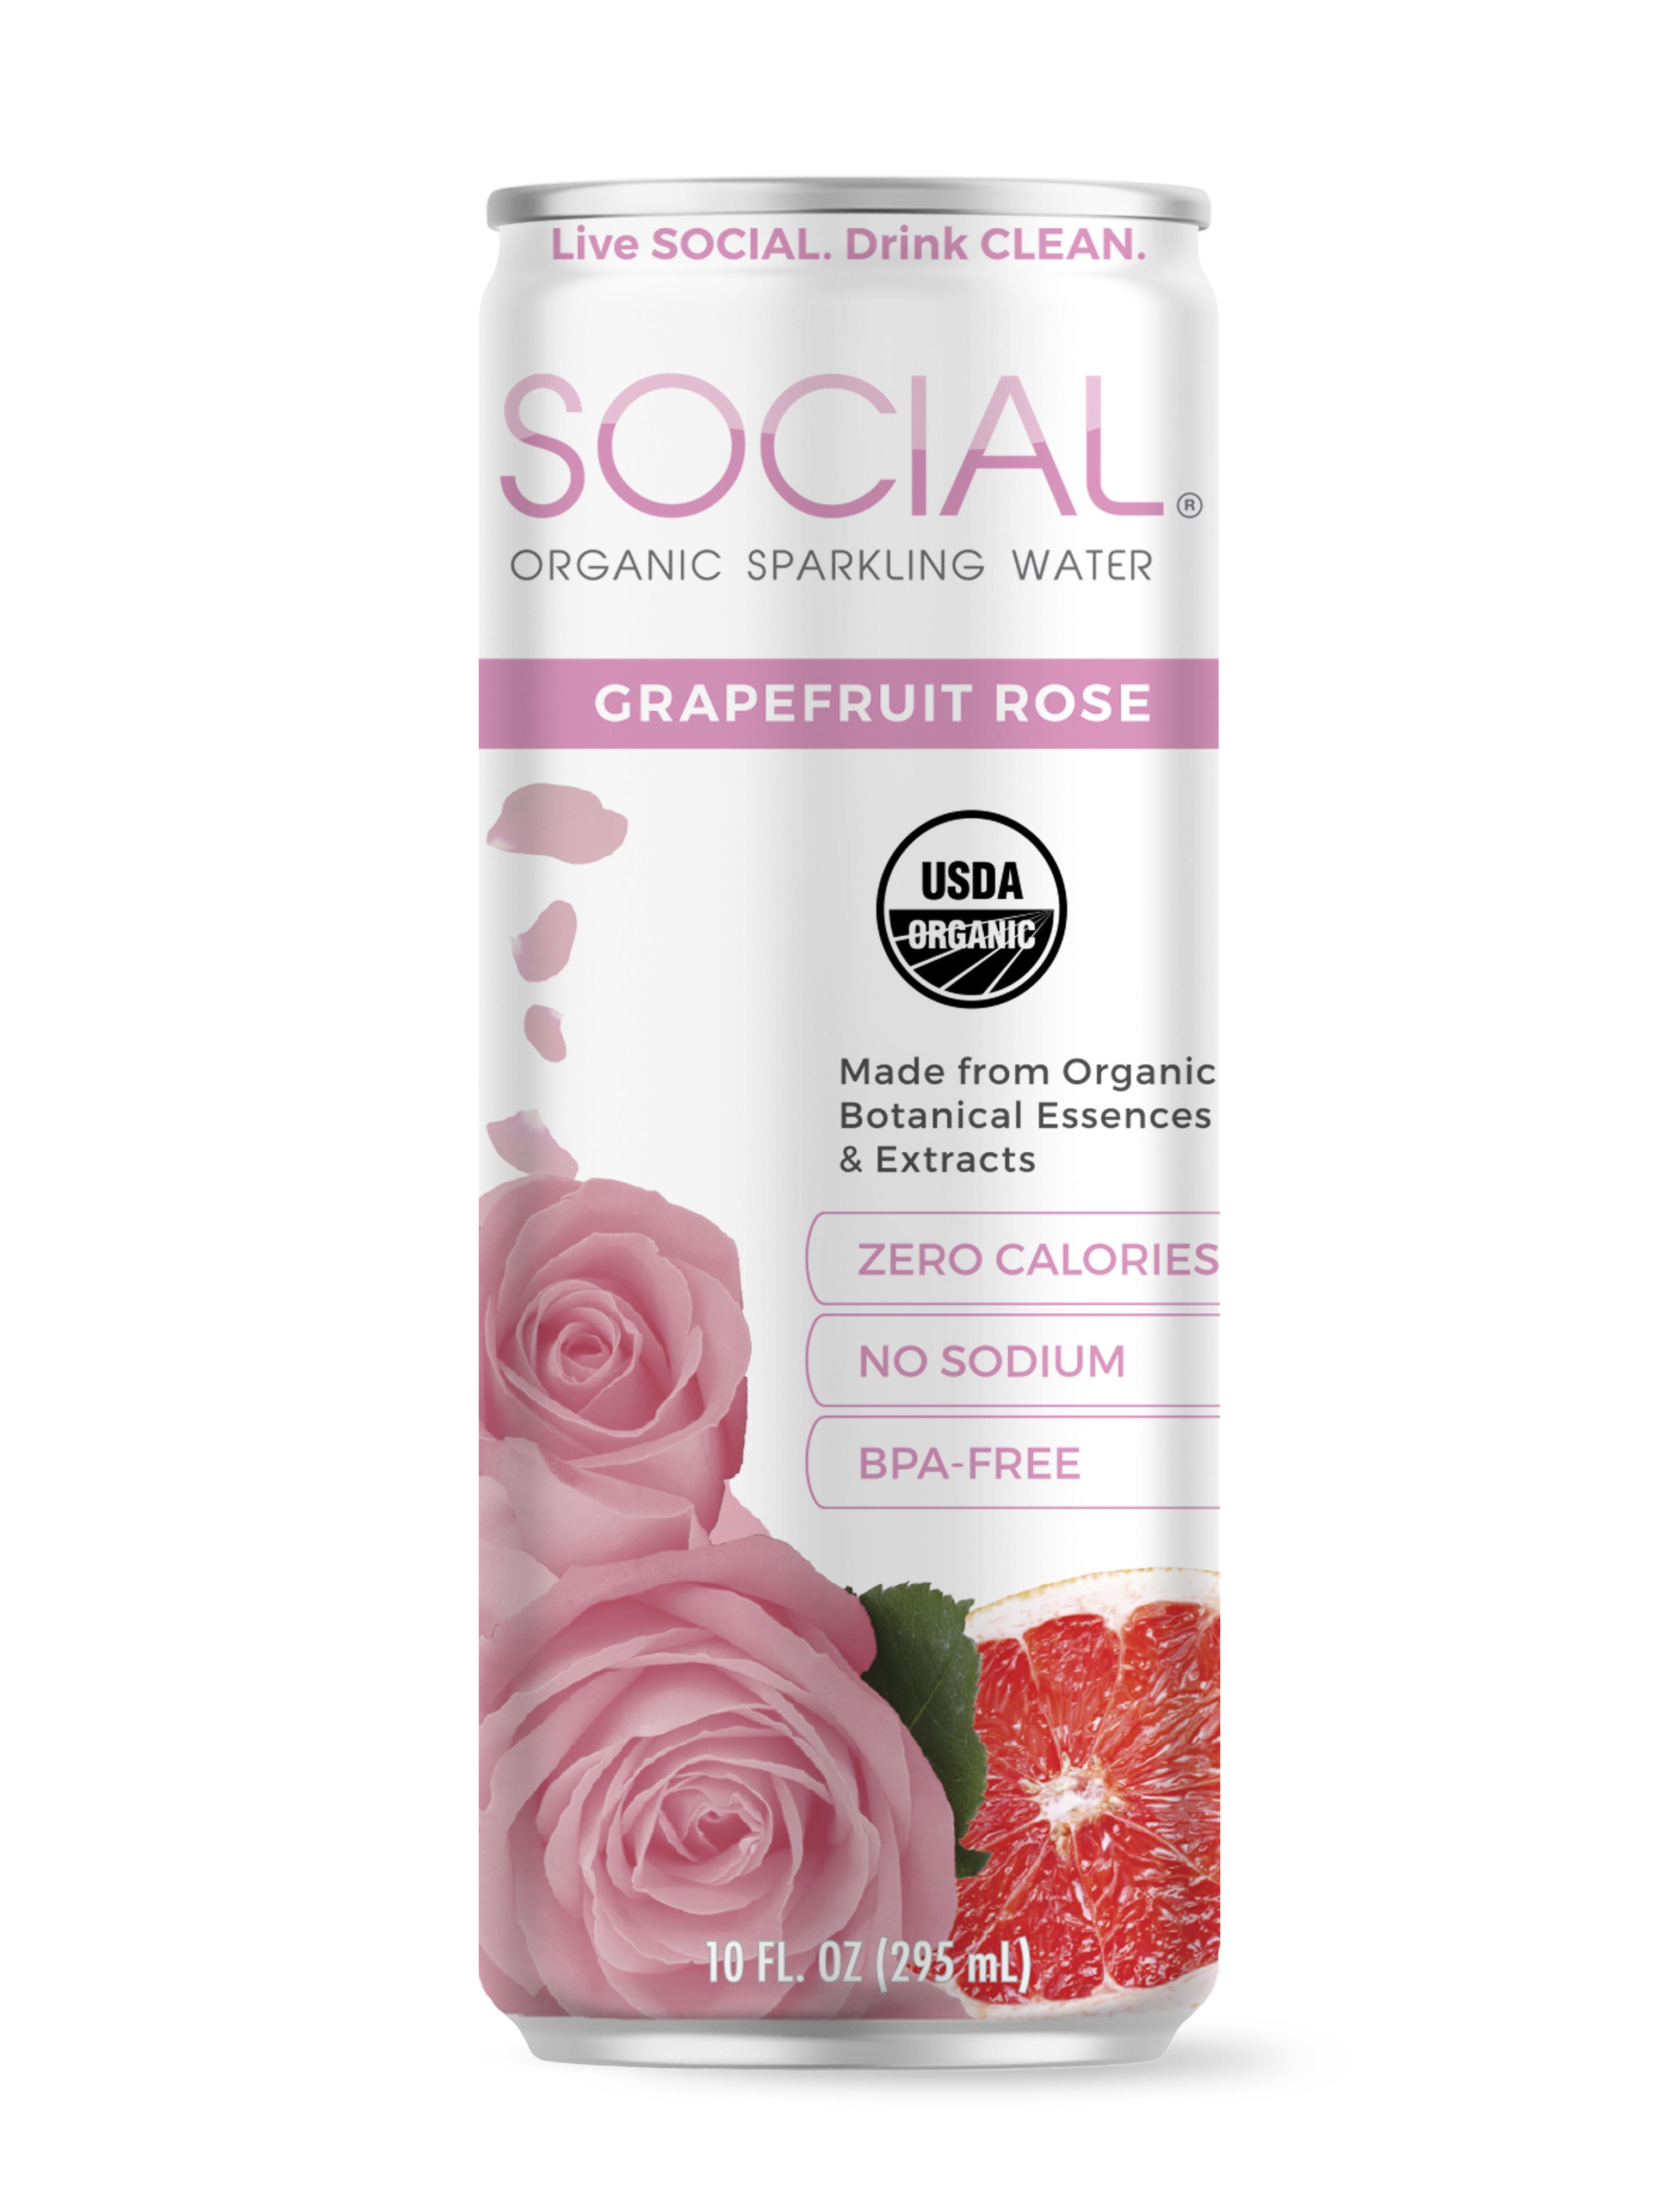 SOCIAL Grapefruit Rose Sparkling Water